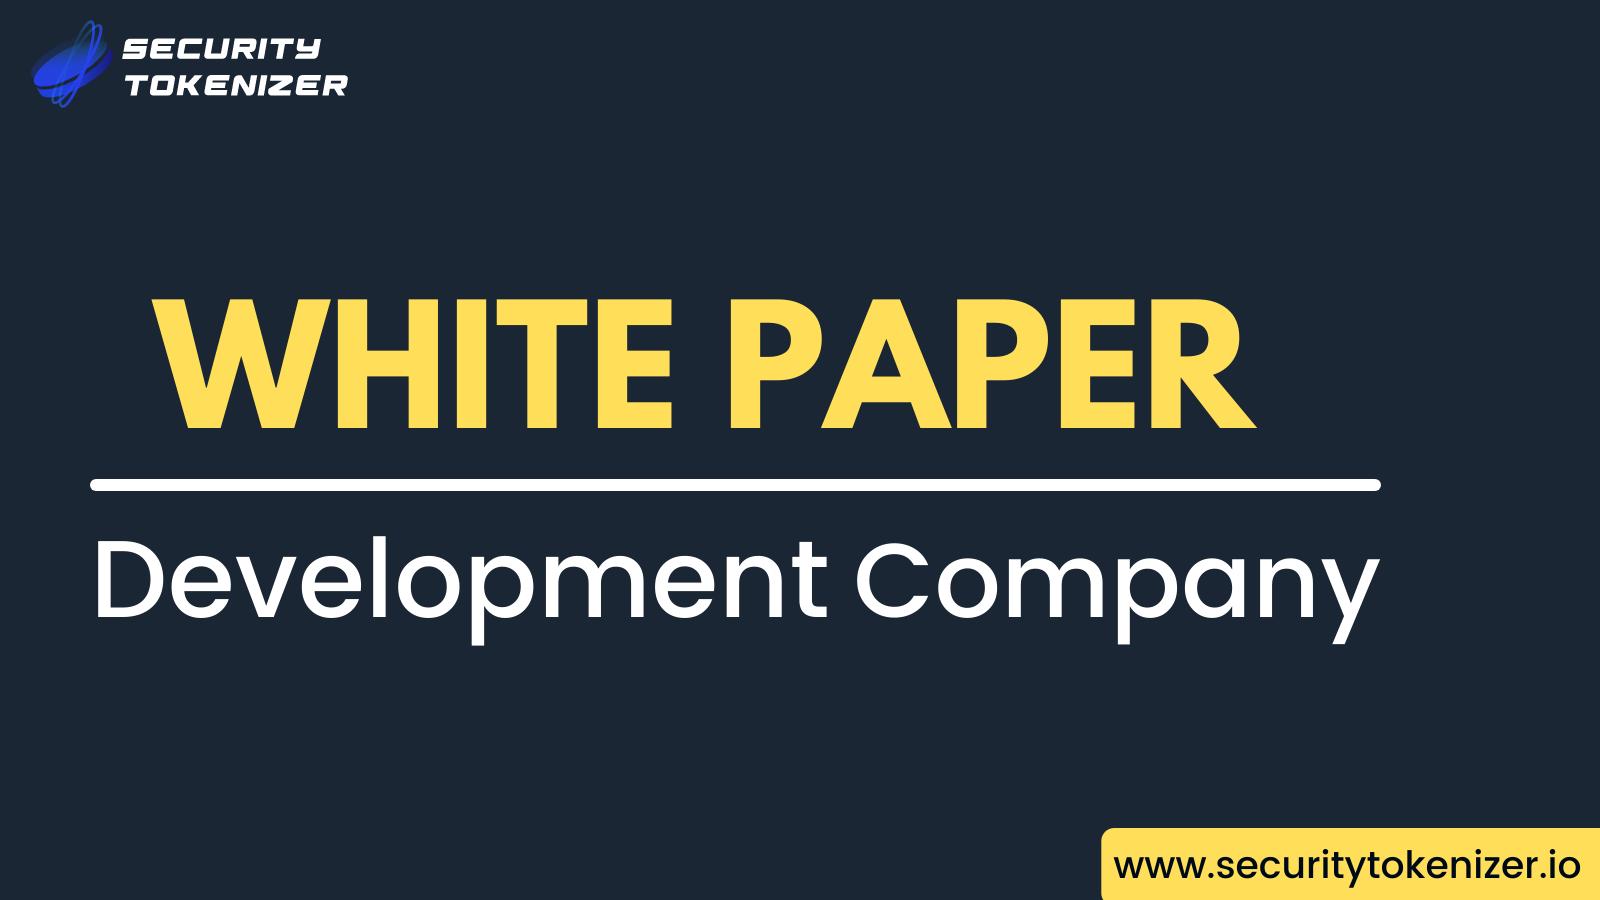 White Paper Development Company - Security Tokenizer